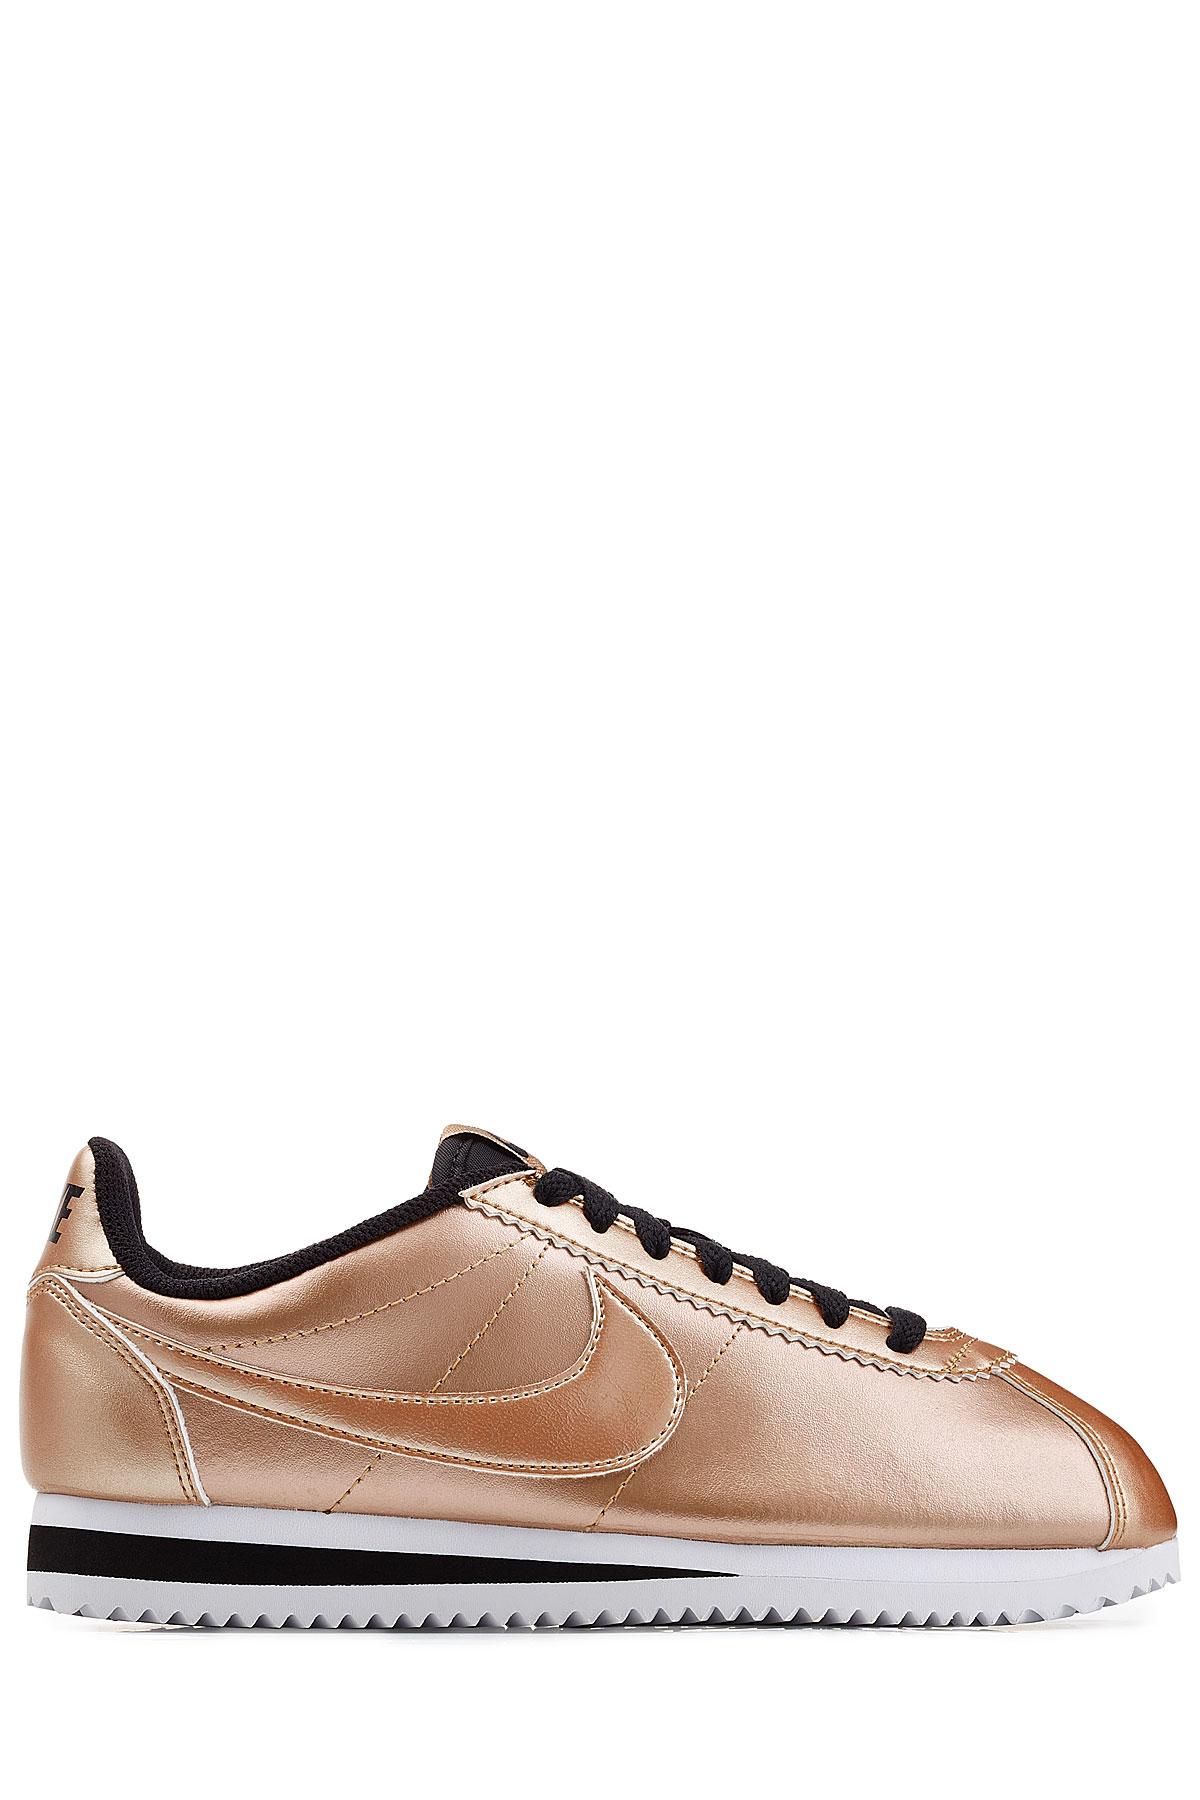 Nike Classic Cortez Metallic